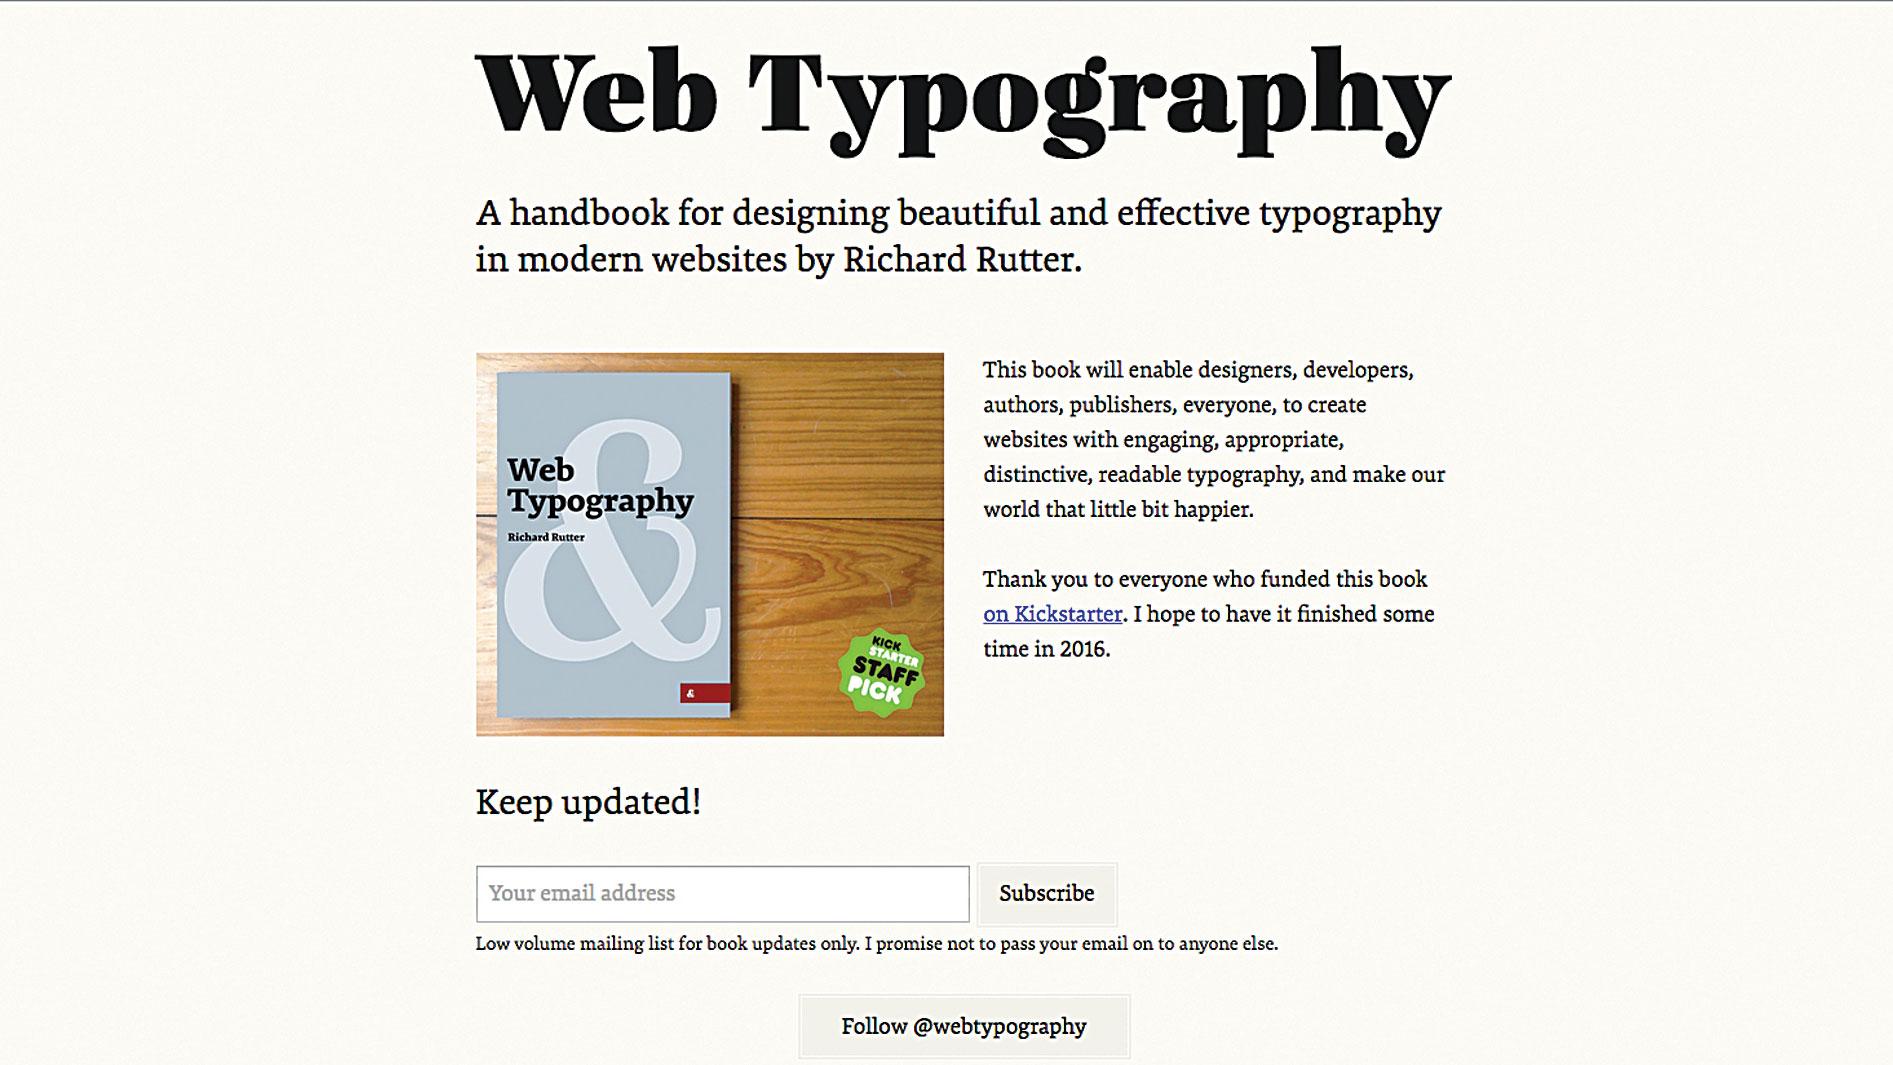 New skills in web design - Typographic principles